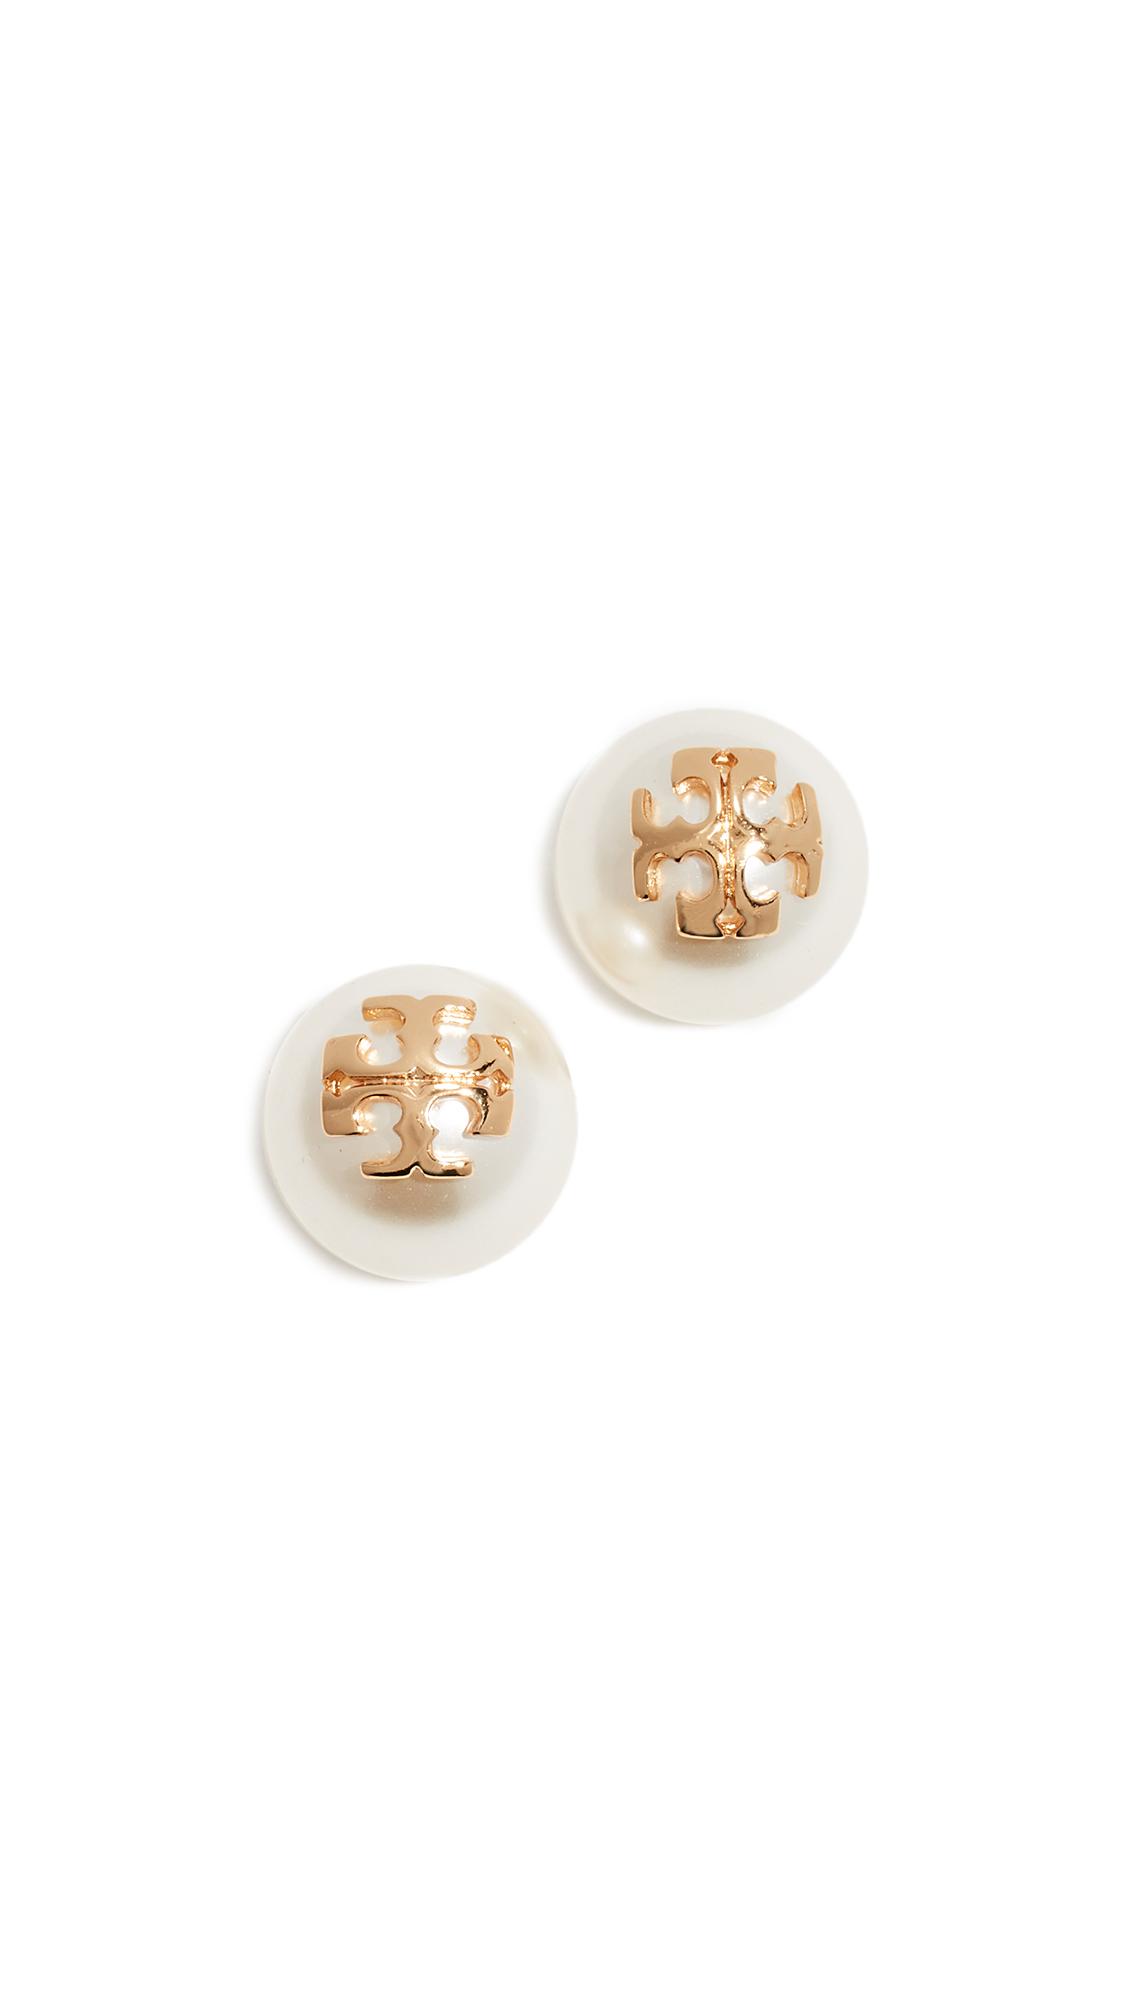 Tory Burch Crystal Pearl Stud Earrings In Ivory/Tory Gold